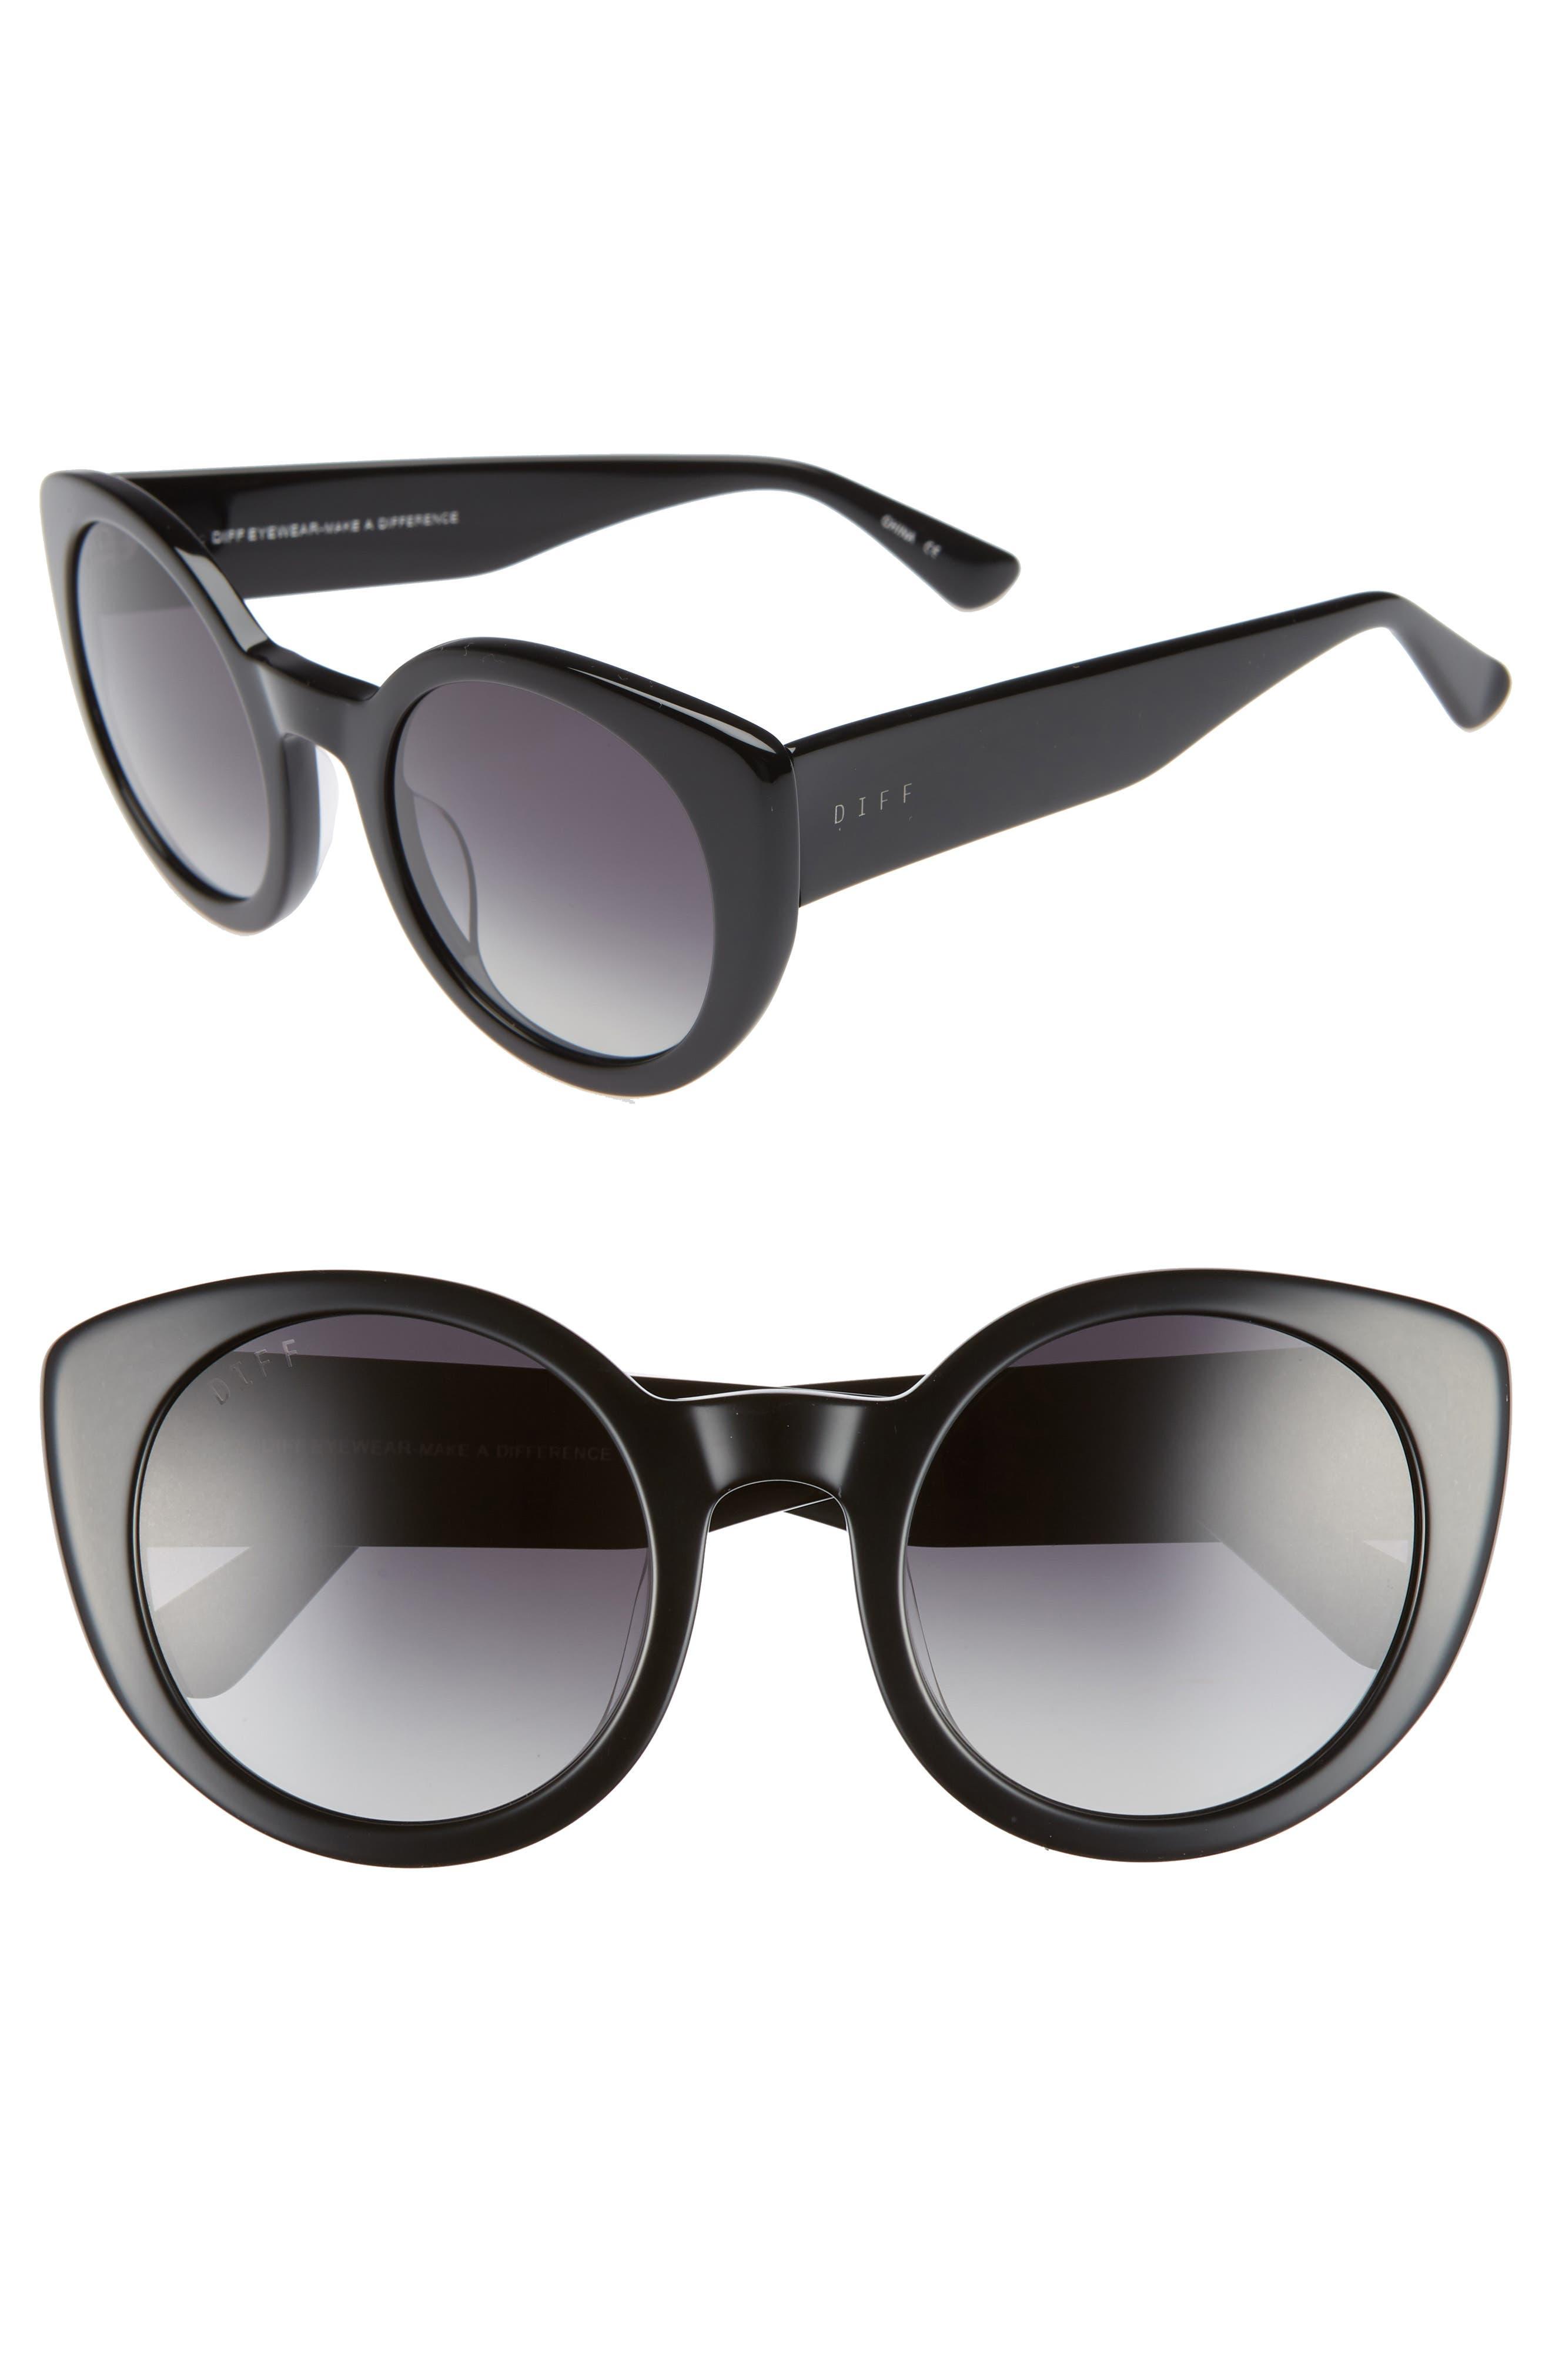 Luna 54mm Polarized Round Sunglasses,                         Main,                         color, BLACK/ GREY